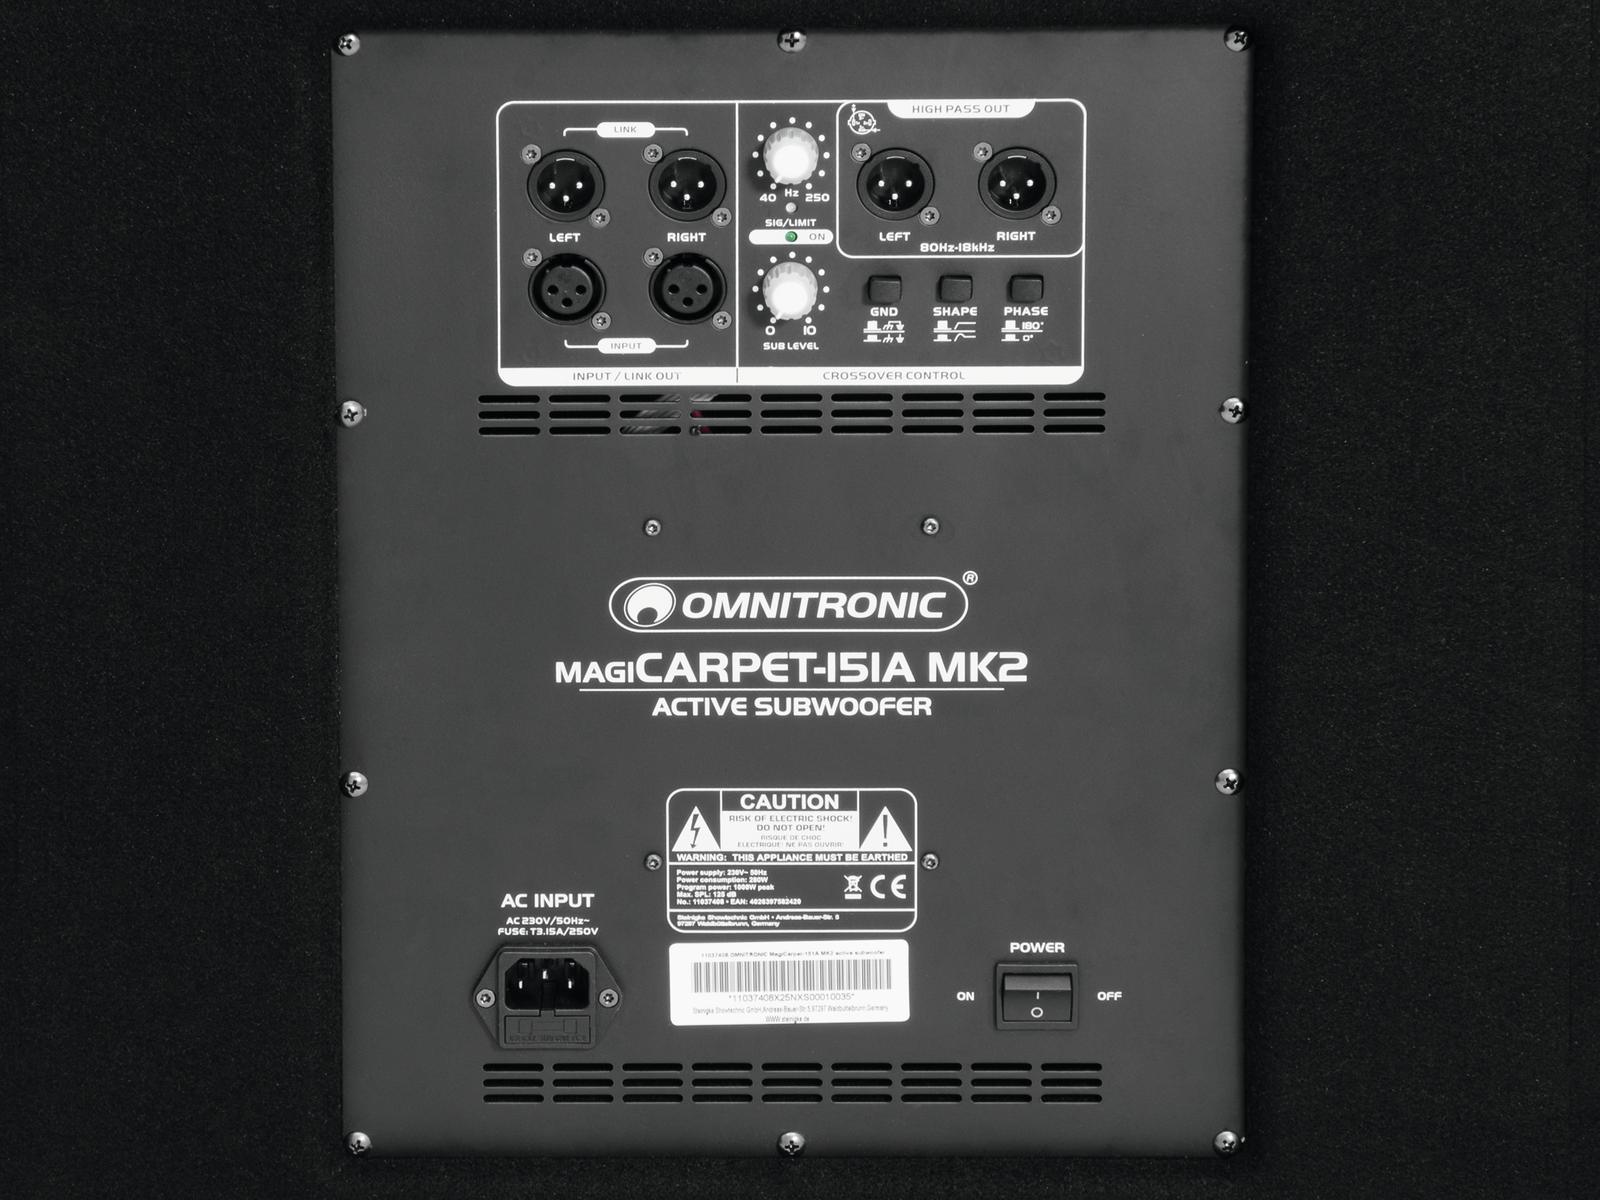 OMNITRONIC MagiCarpet-151A MK2 Aktivsubwoofer